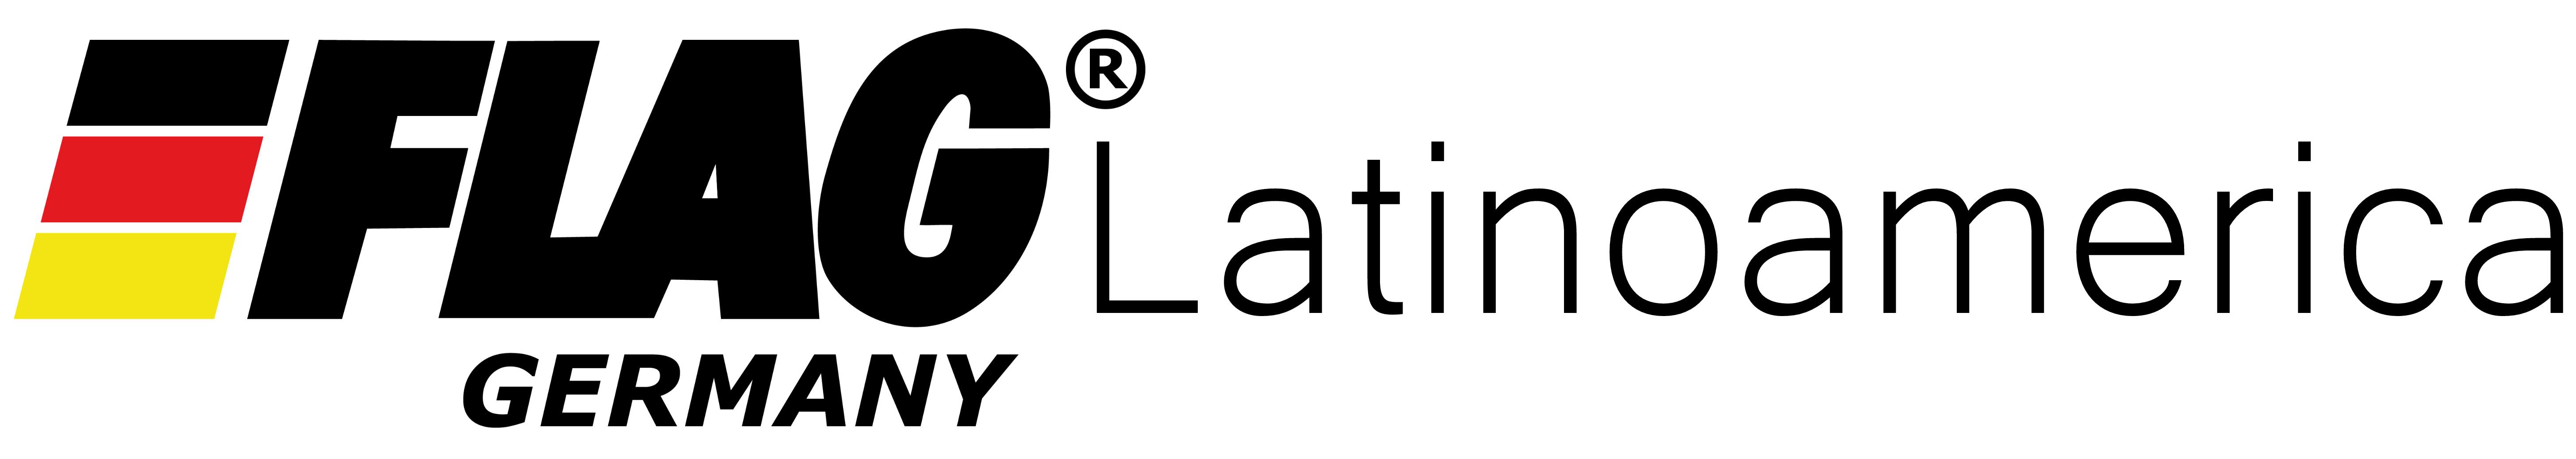 Flag-Latinoamerica